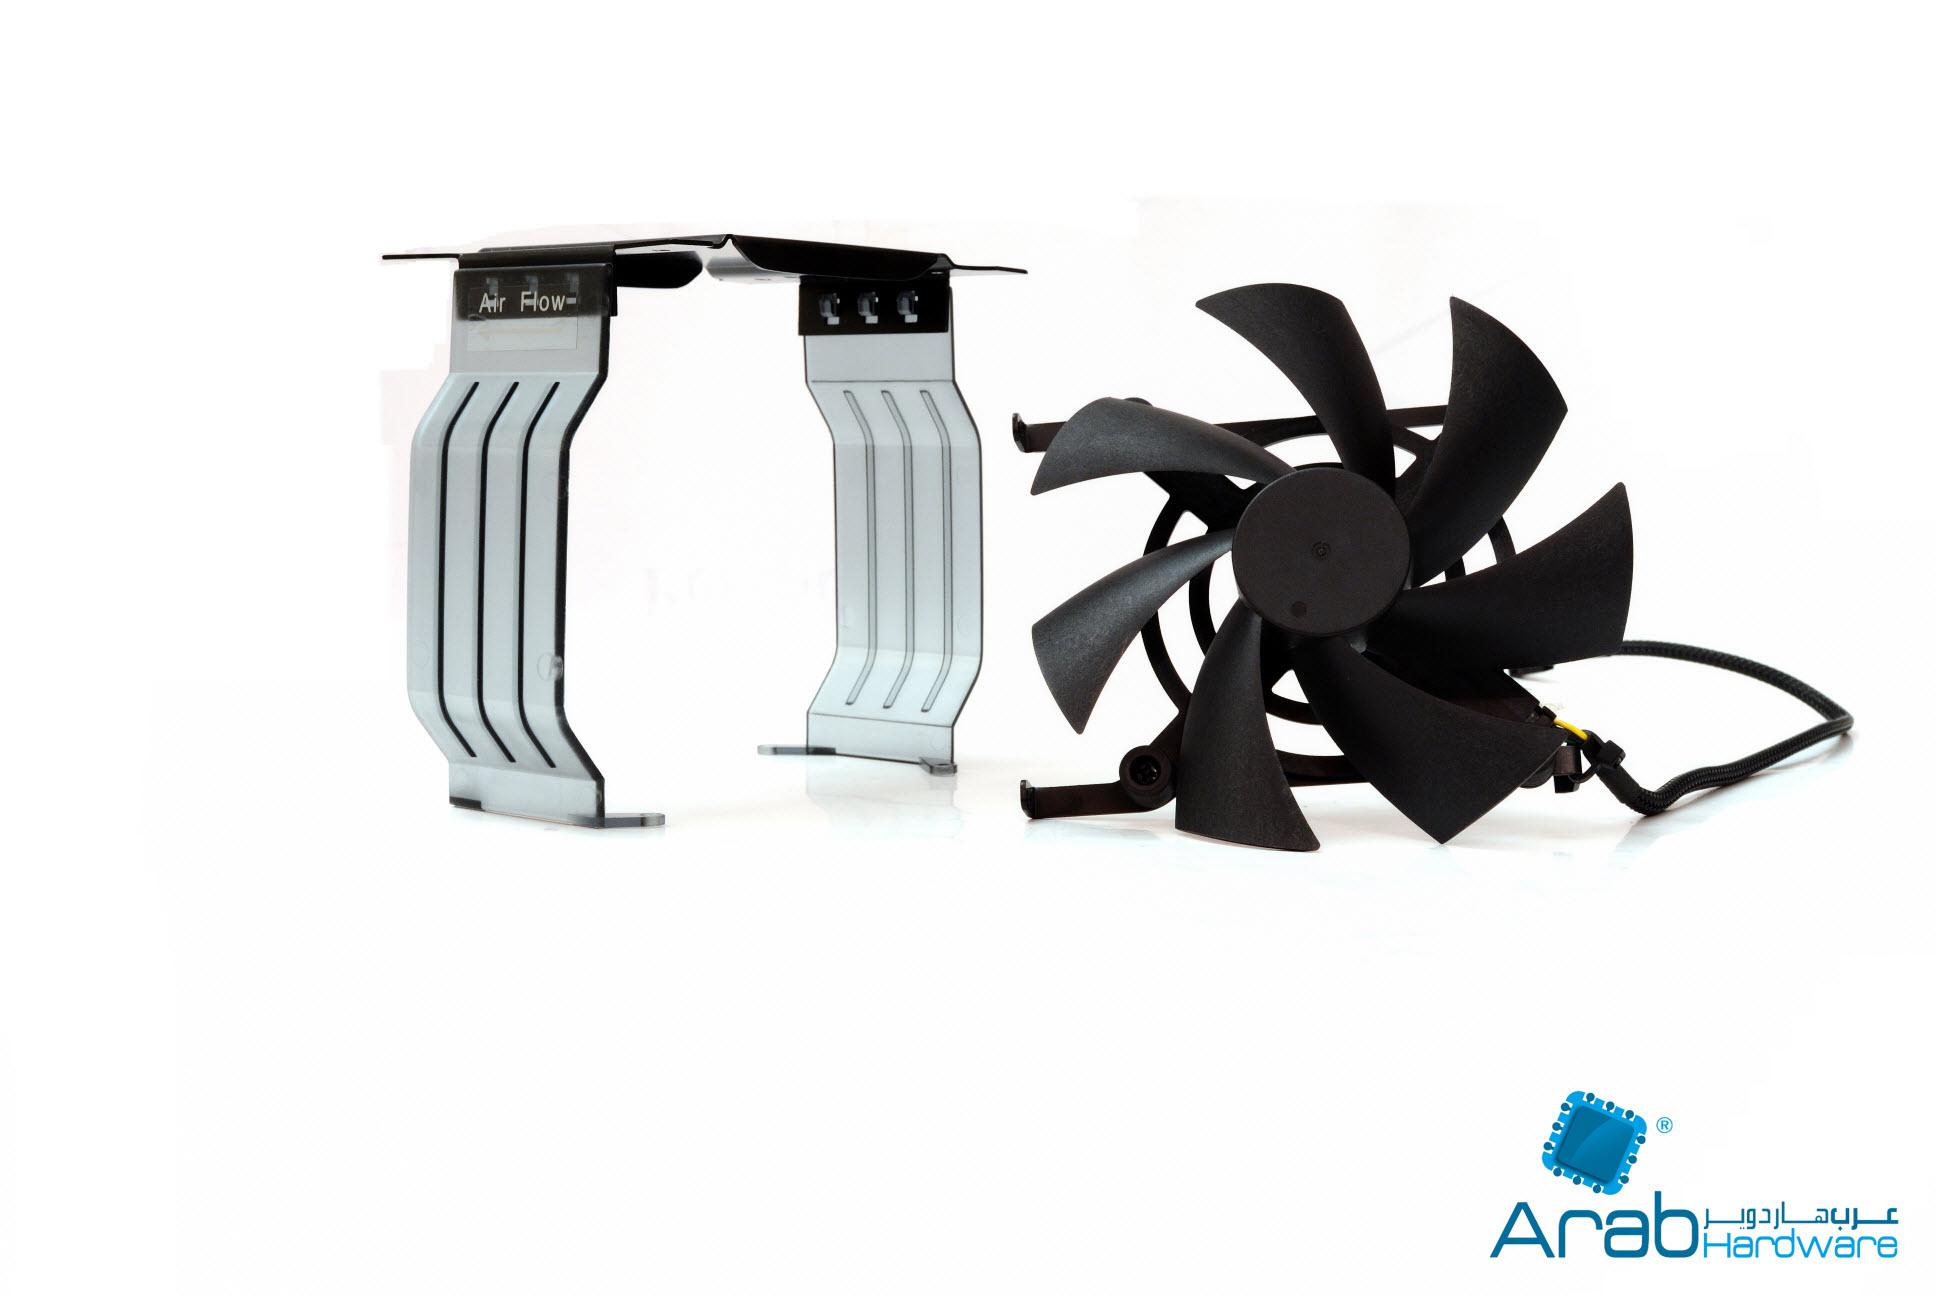 Antec KÜHLER Box -Arabhardware Reviews